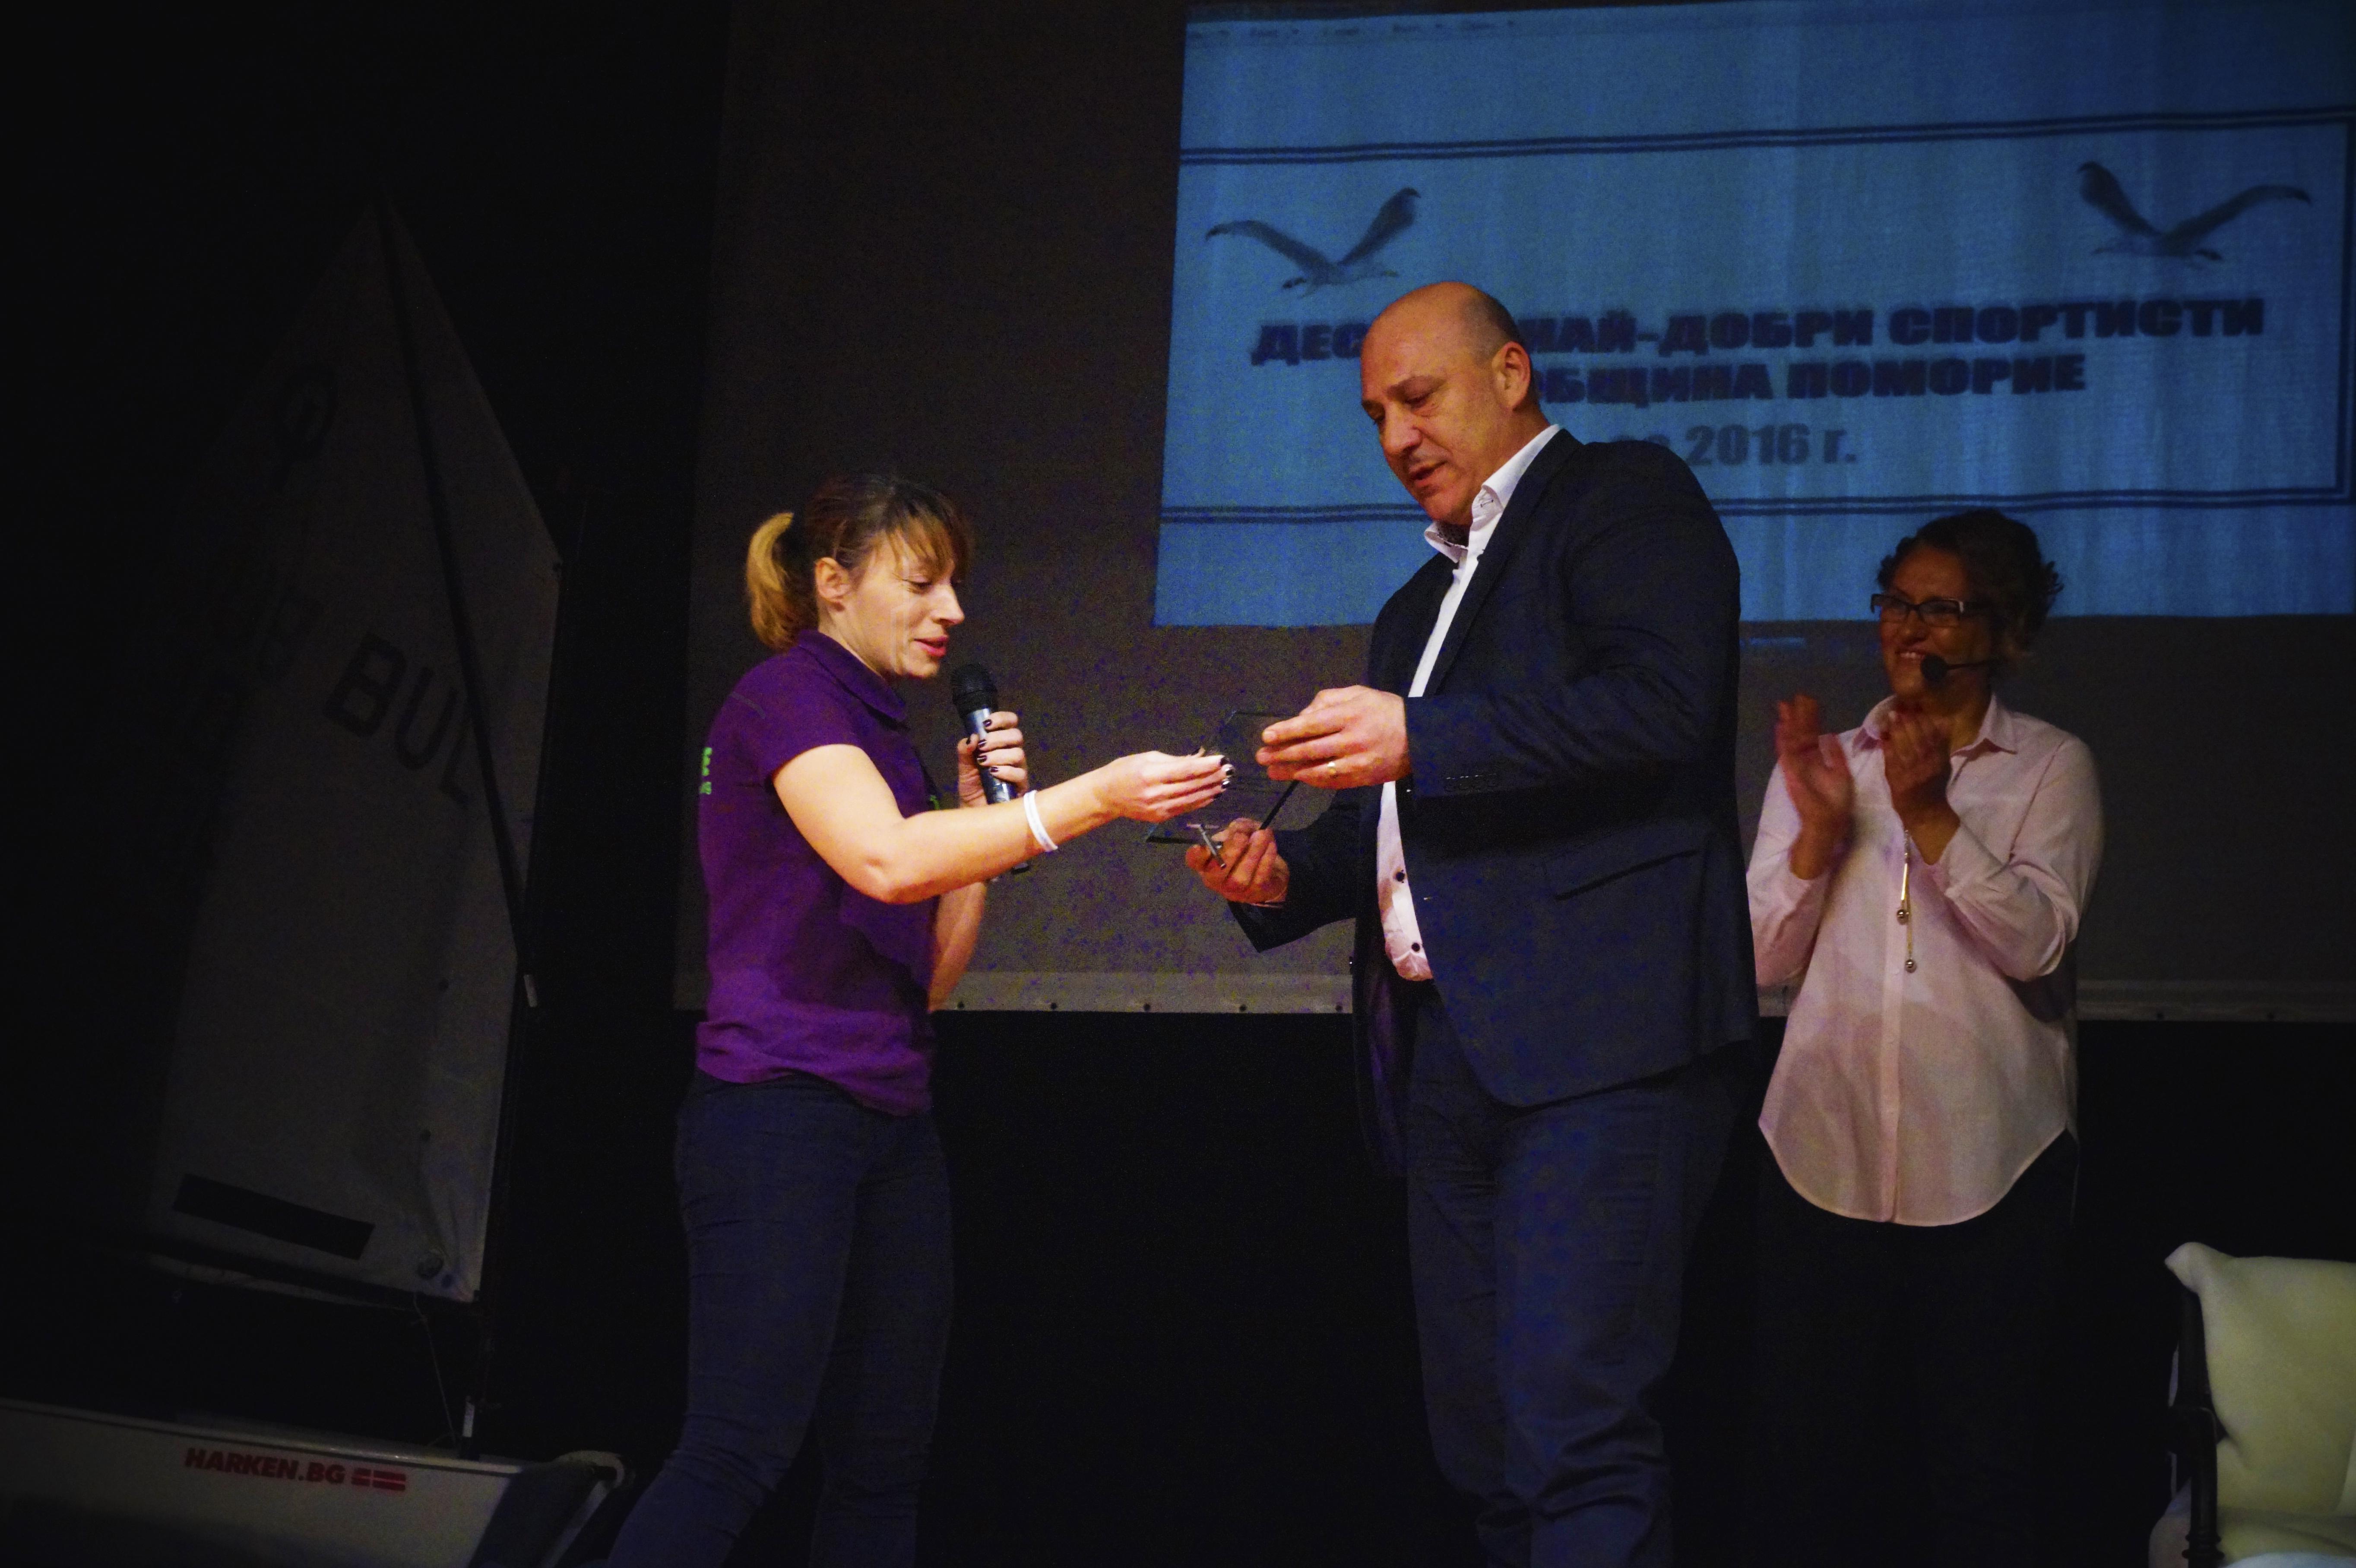 Award mayor